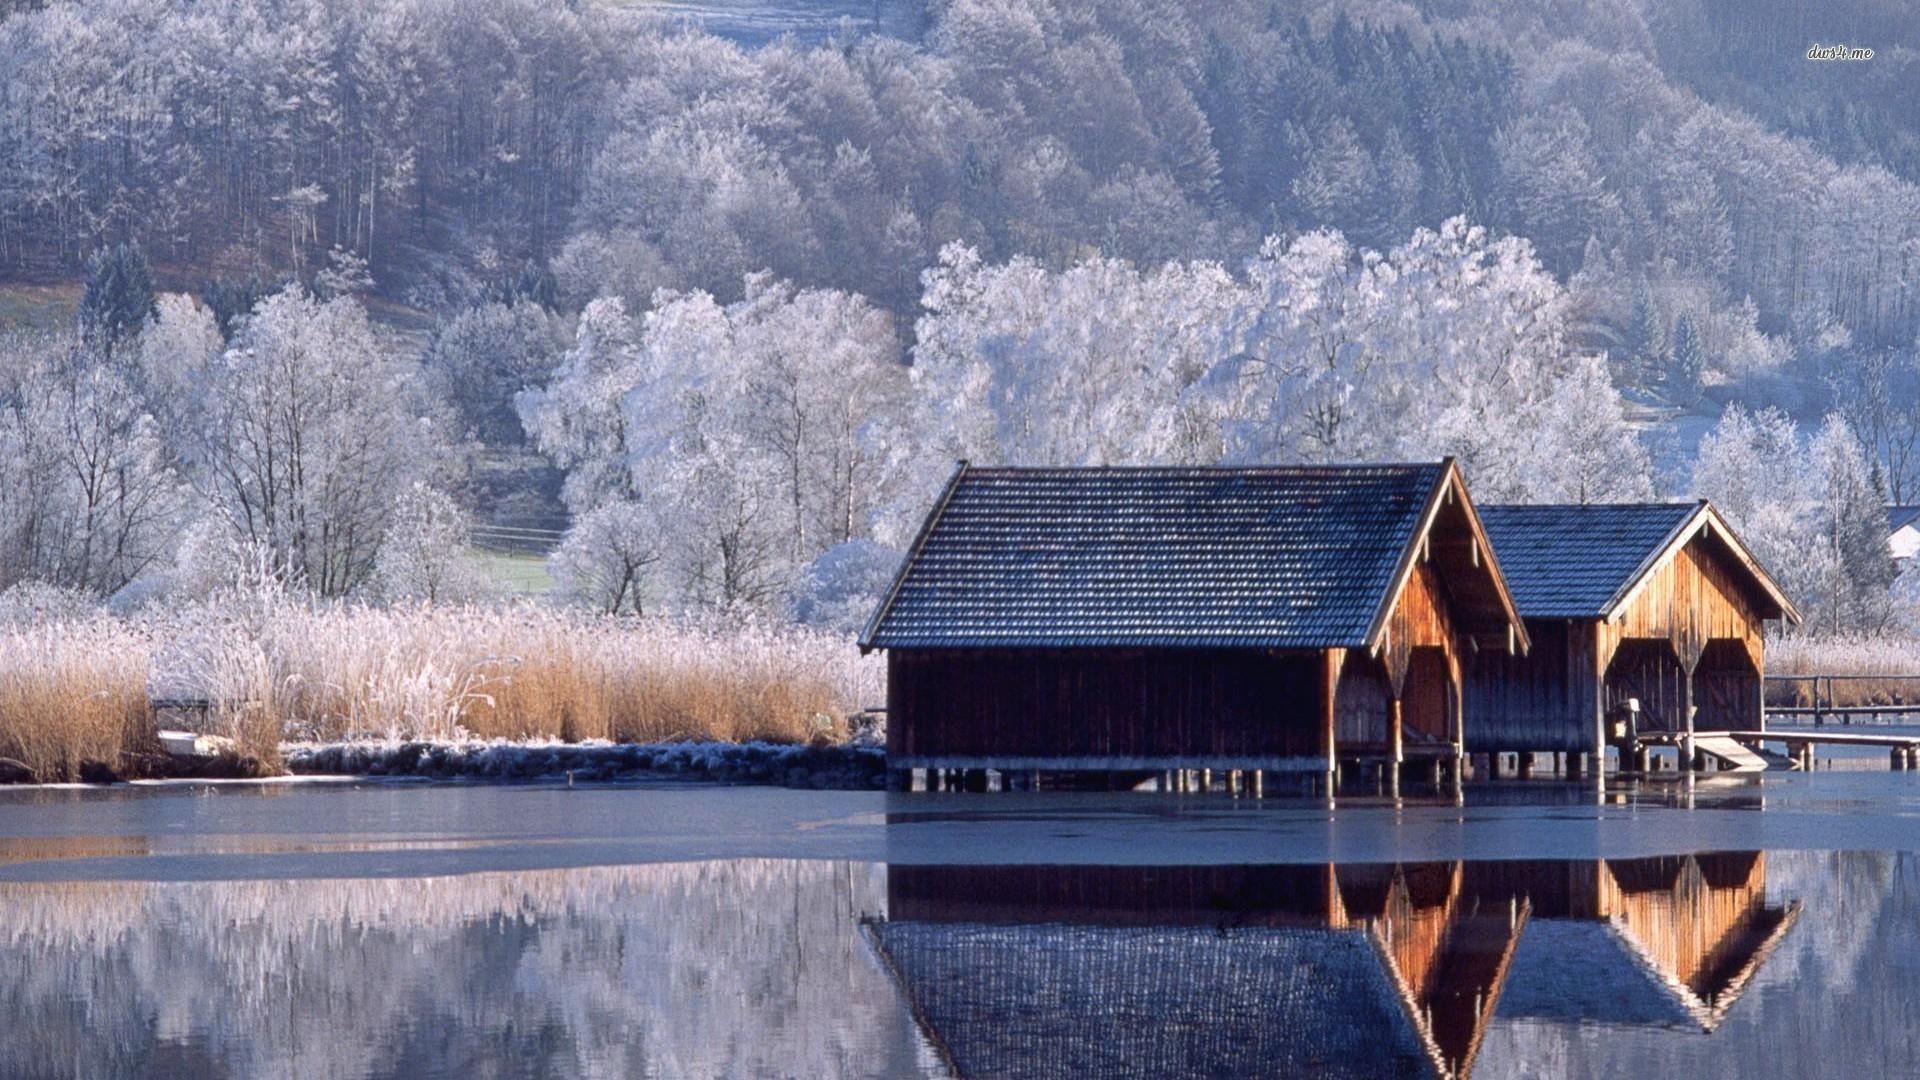 Stunning Winter Wallpapers 1920×1200 Winter Backgrounds For Desktop (51  Wallpapers)   Adorable